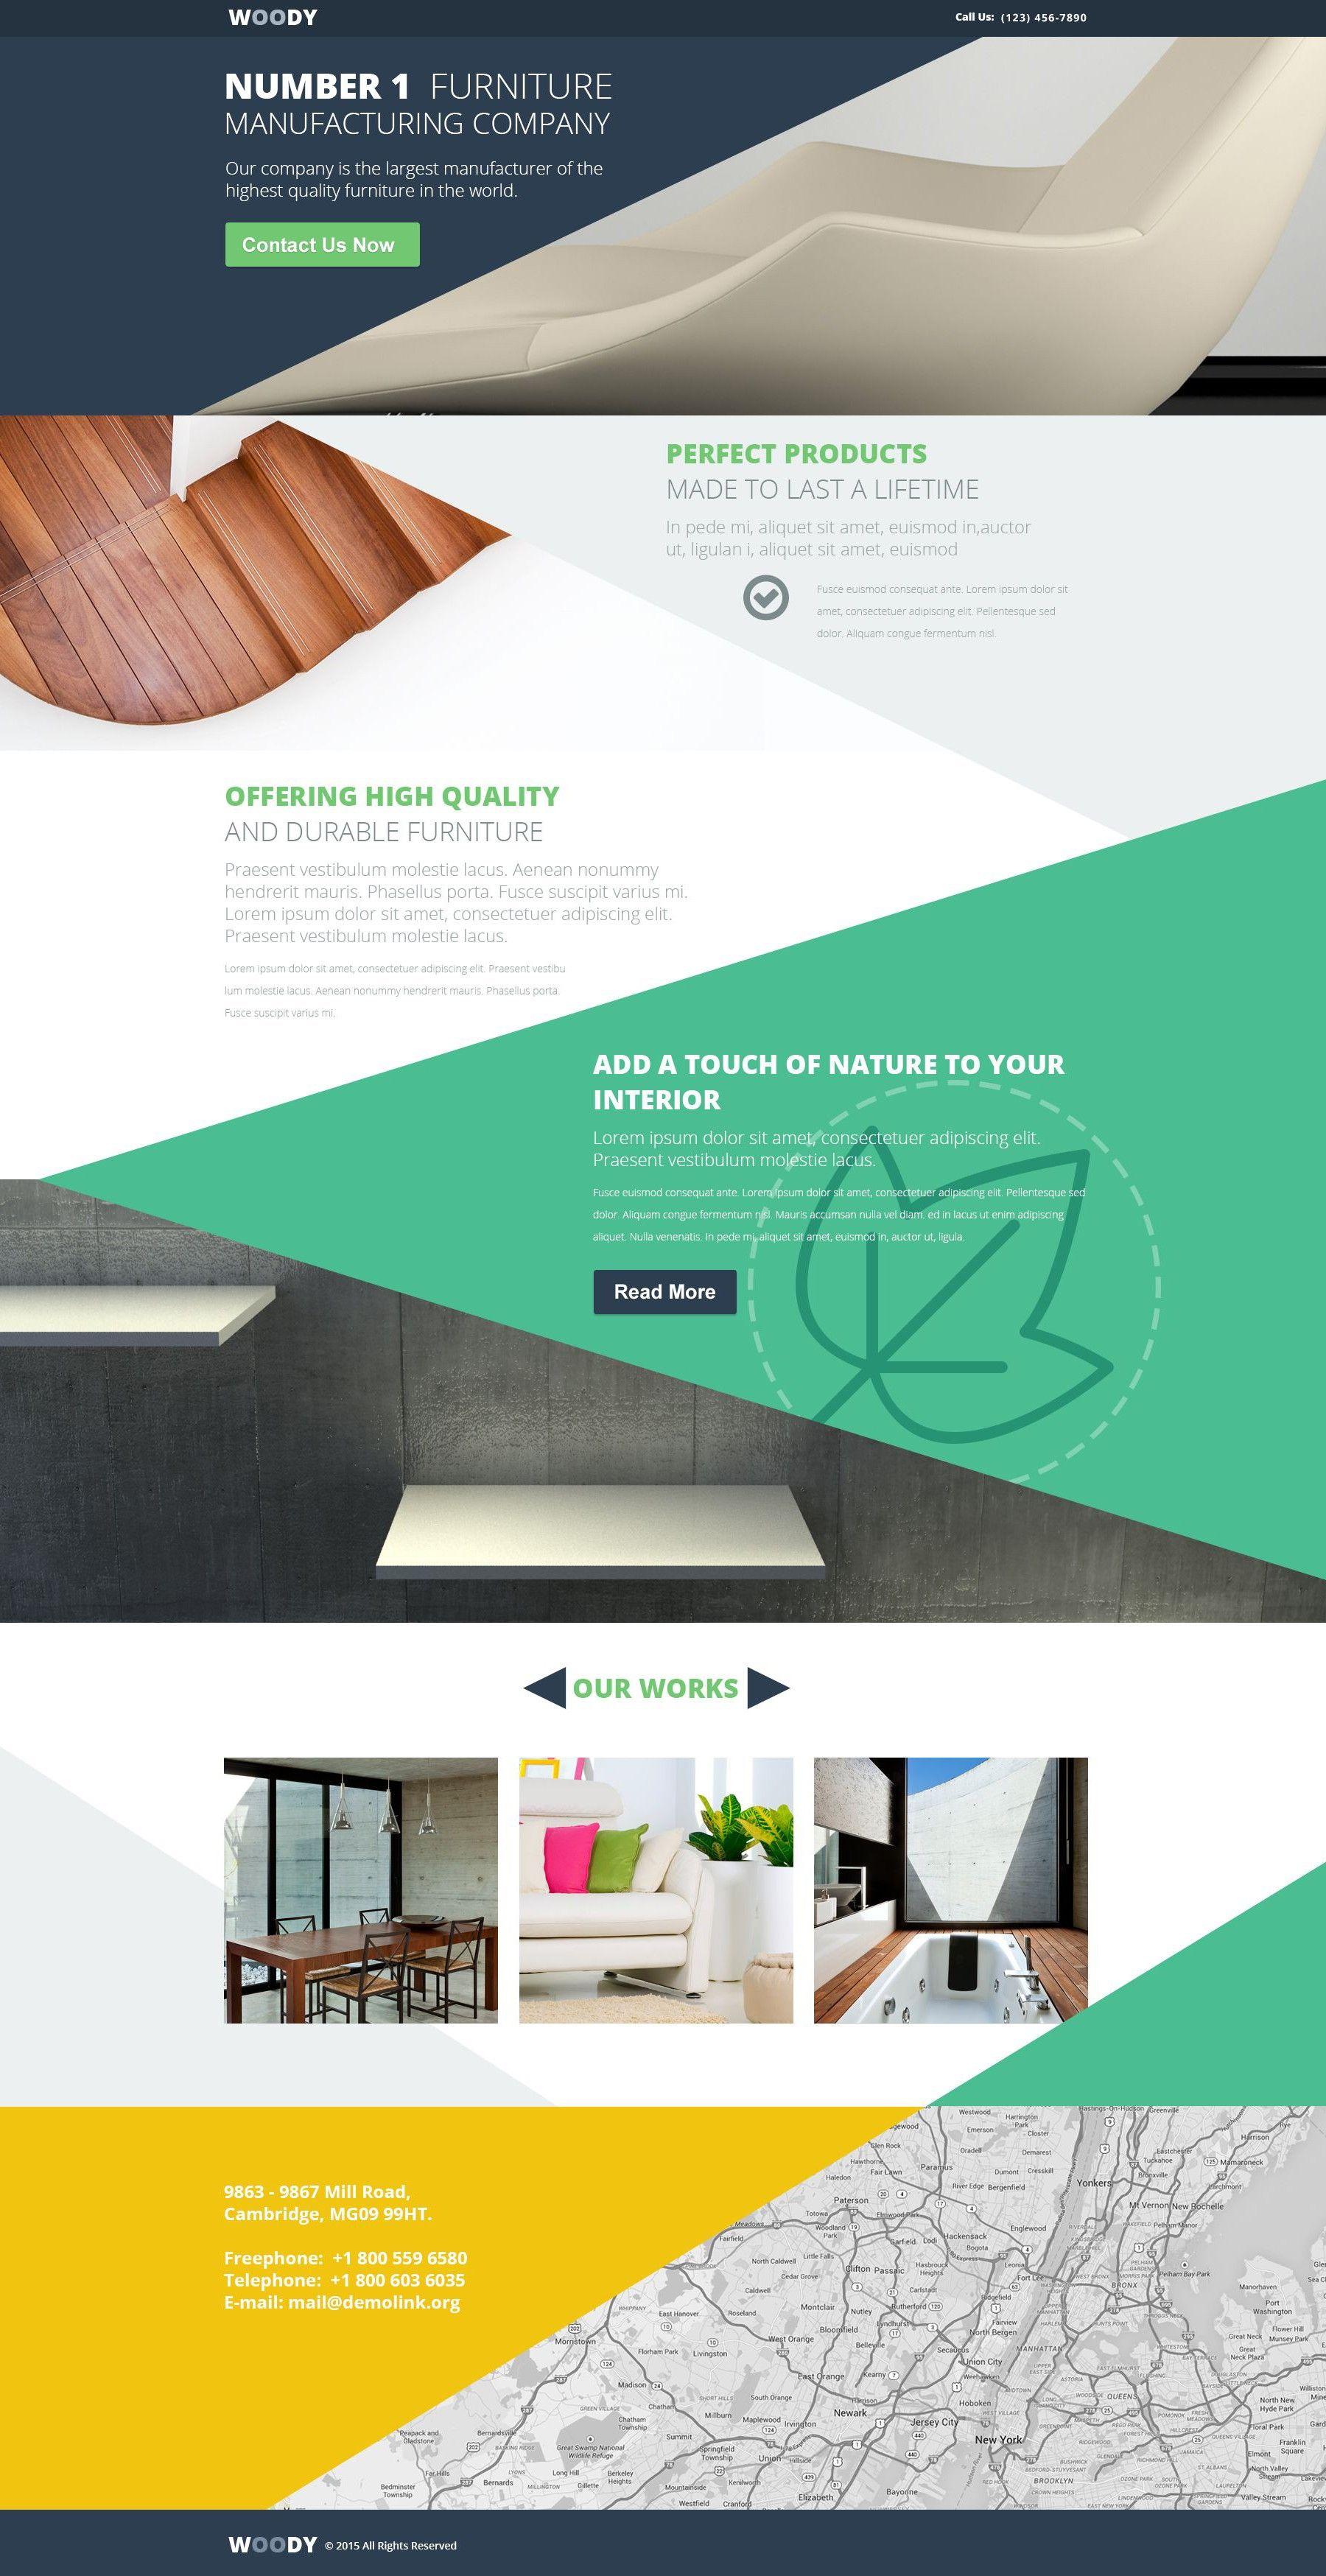 Woody Wood Landing Page Template By Templatemonster Promo Code Ui